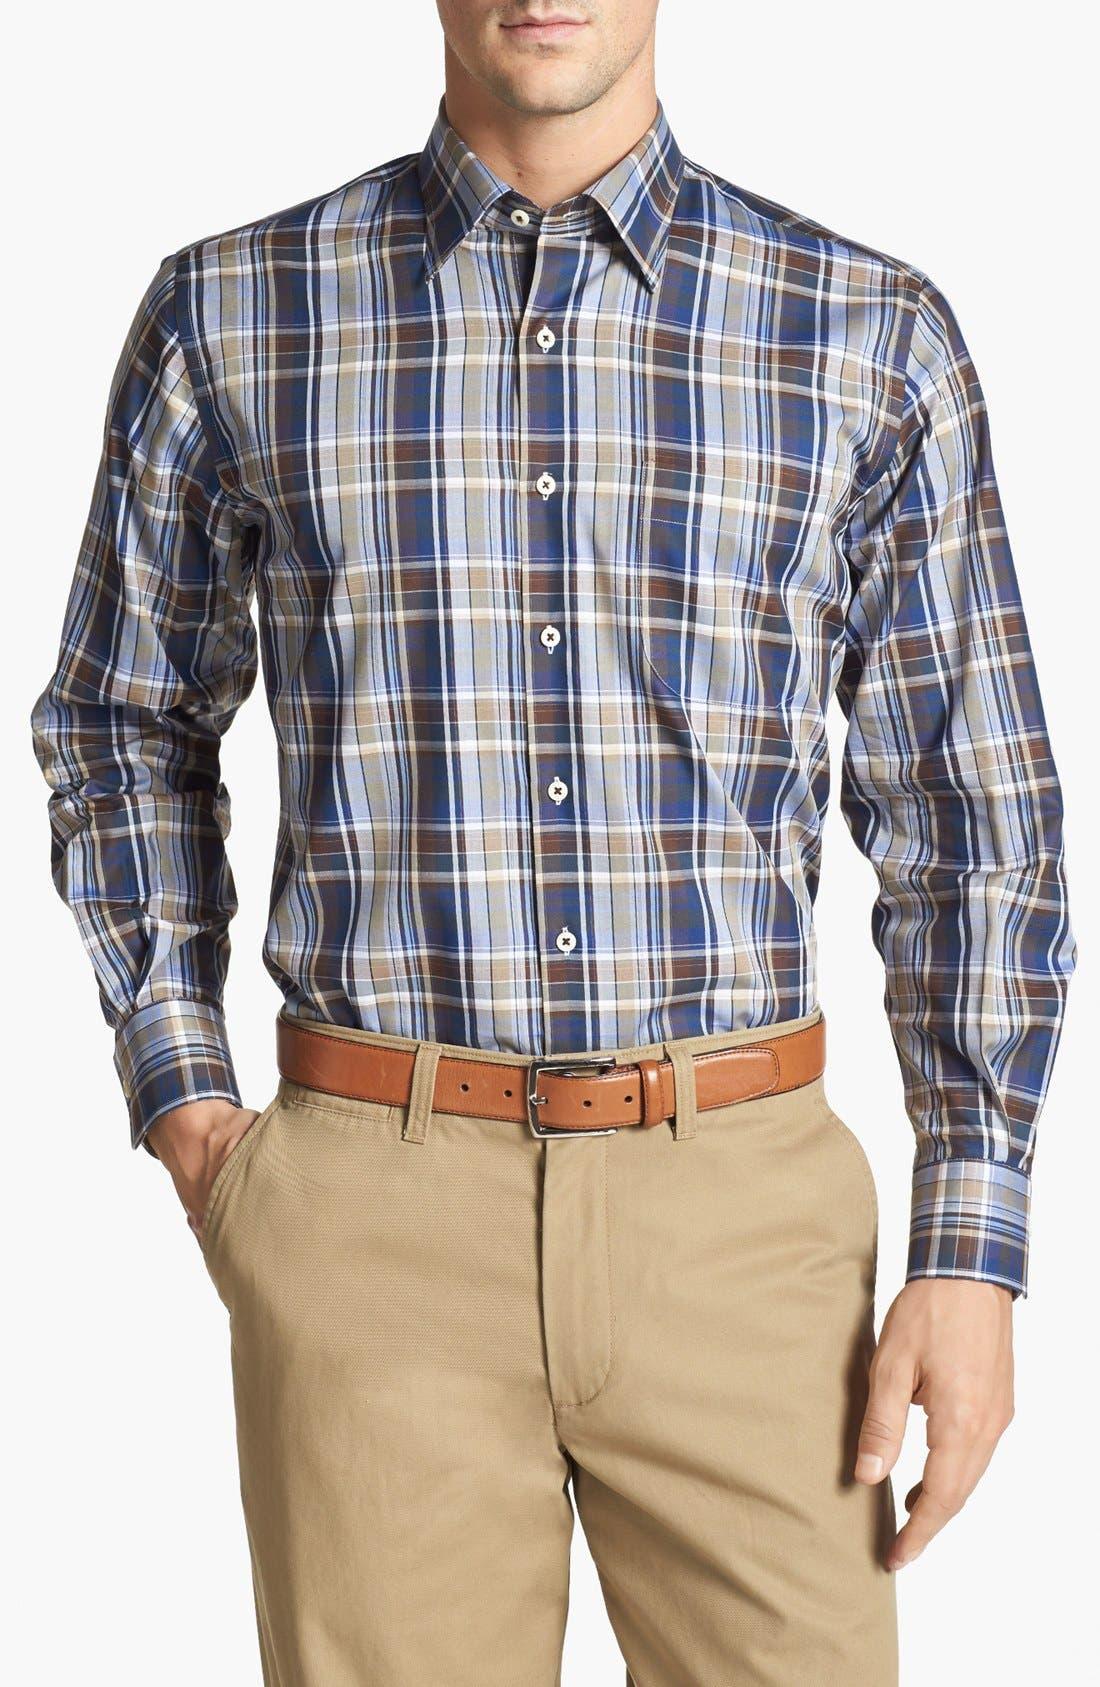 Alternate Image 1 Selected - Peter Millar Plaid Sport Shirt (Tall)